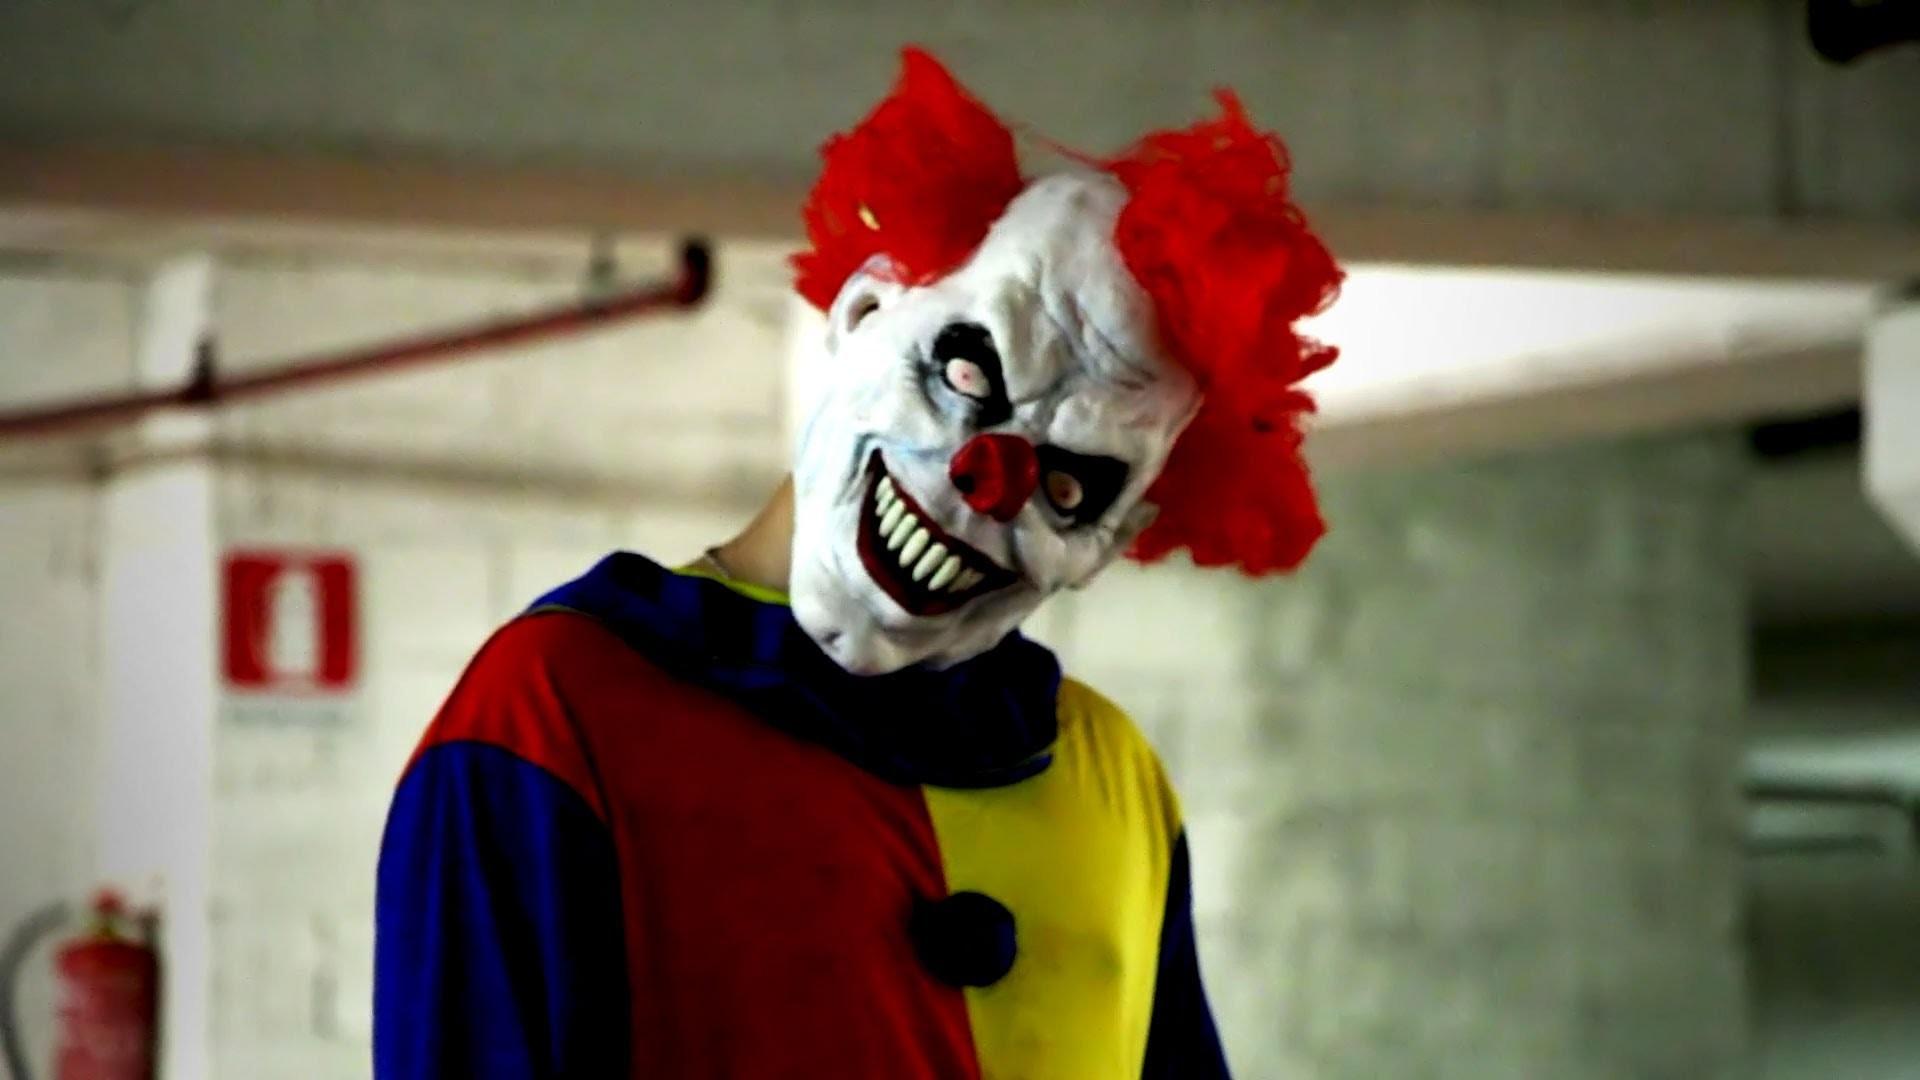 Res: 1920x1080, Creepy Clown Scares Kids in South Carolina